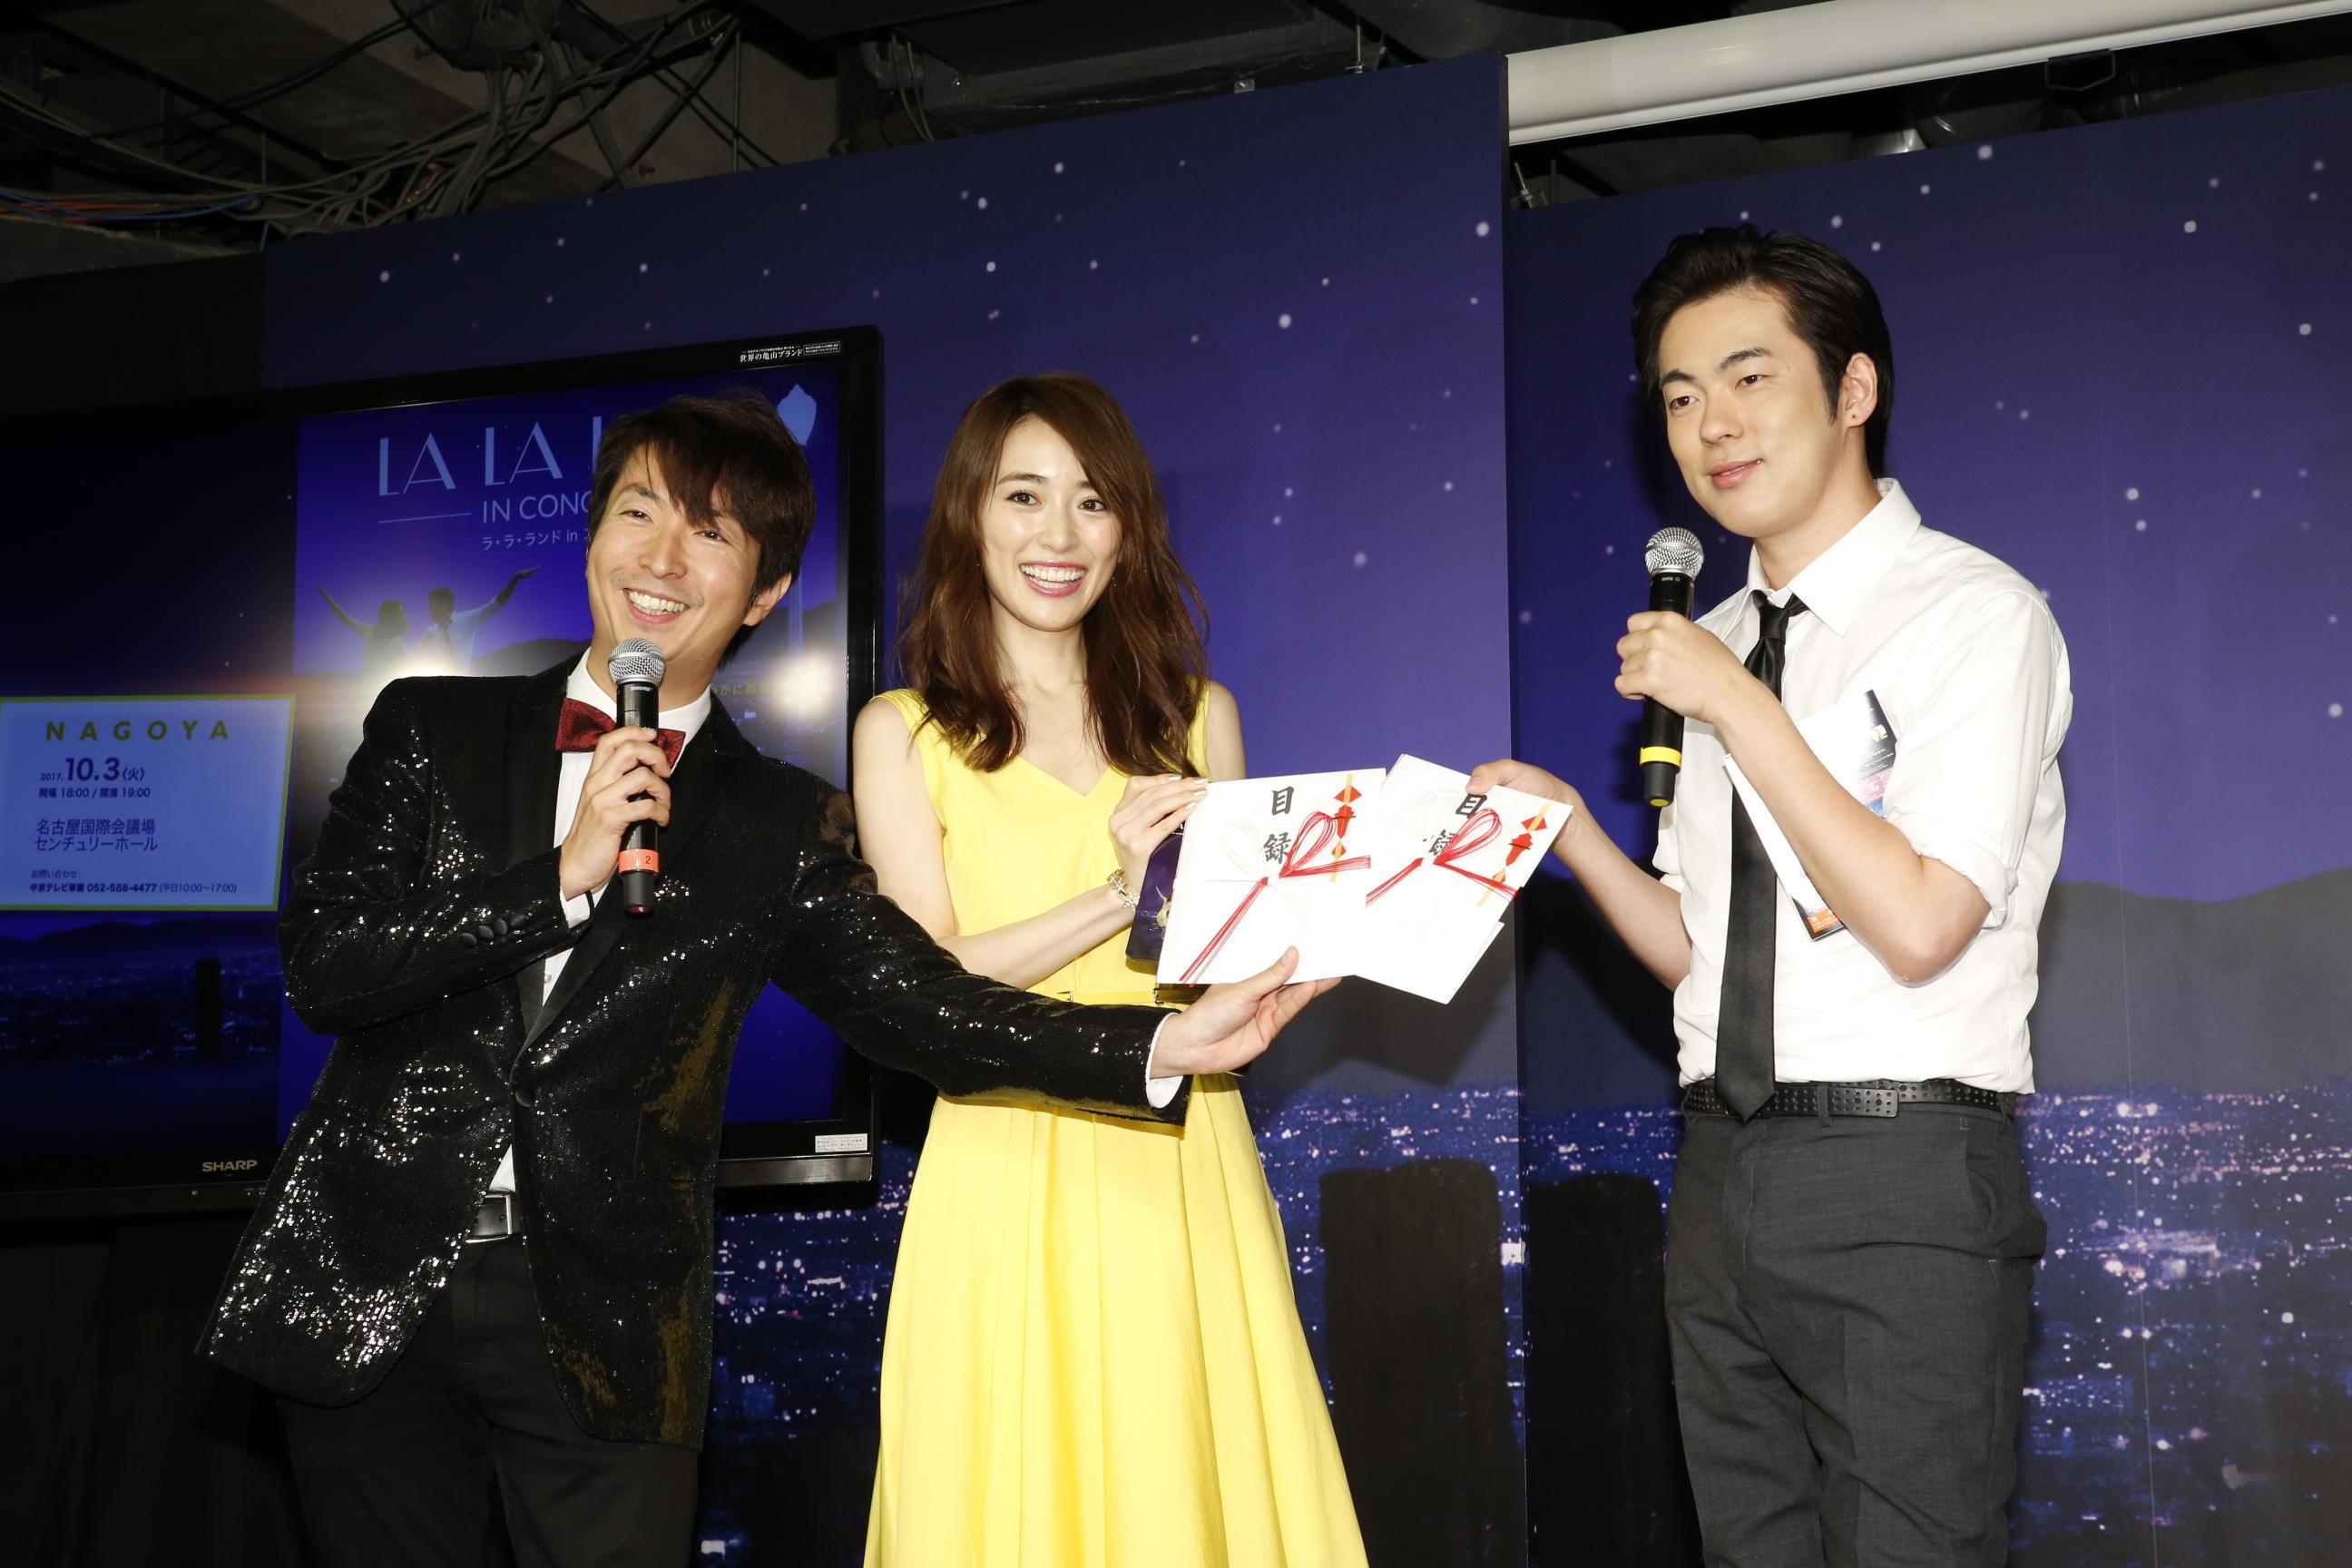 http://news.yoshimoto.co.jp/20170802191937-4c6503a87005001b57a537519d495a8e7fc13437.jpg